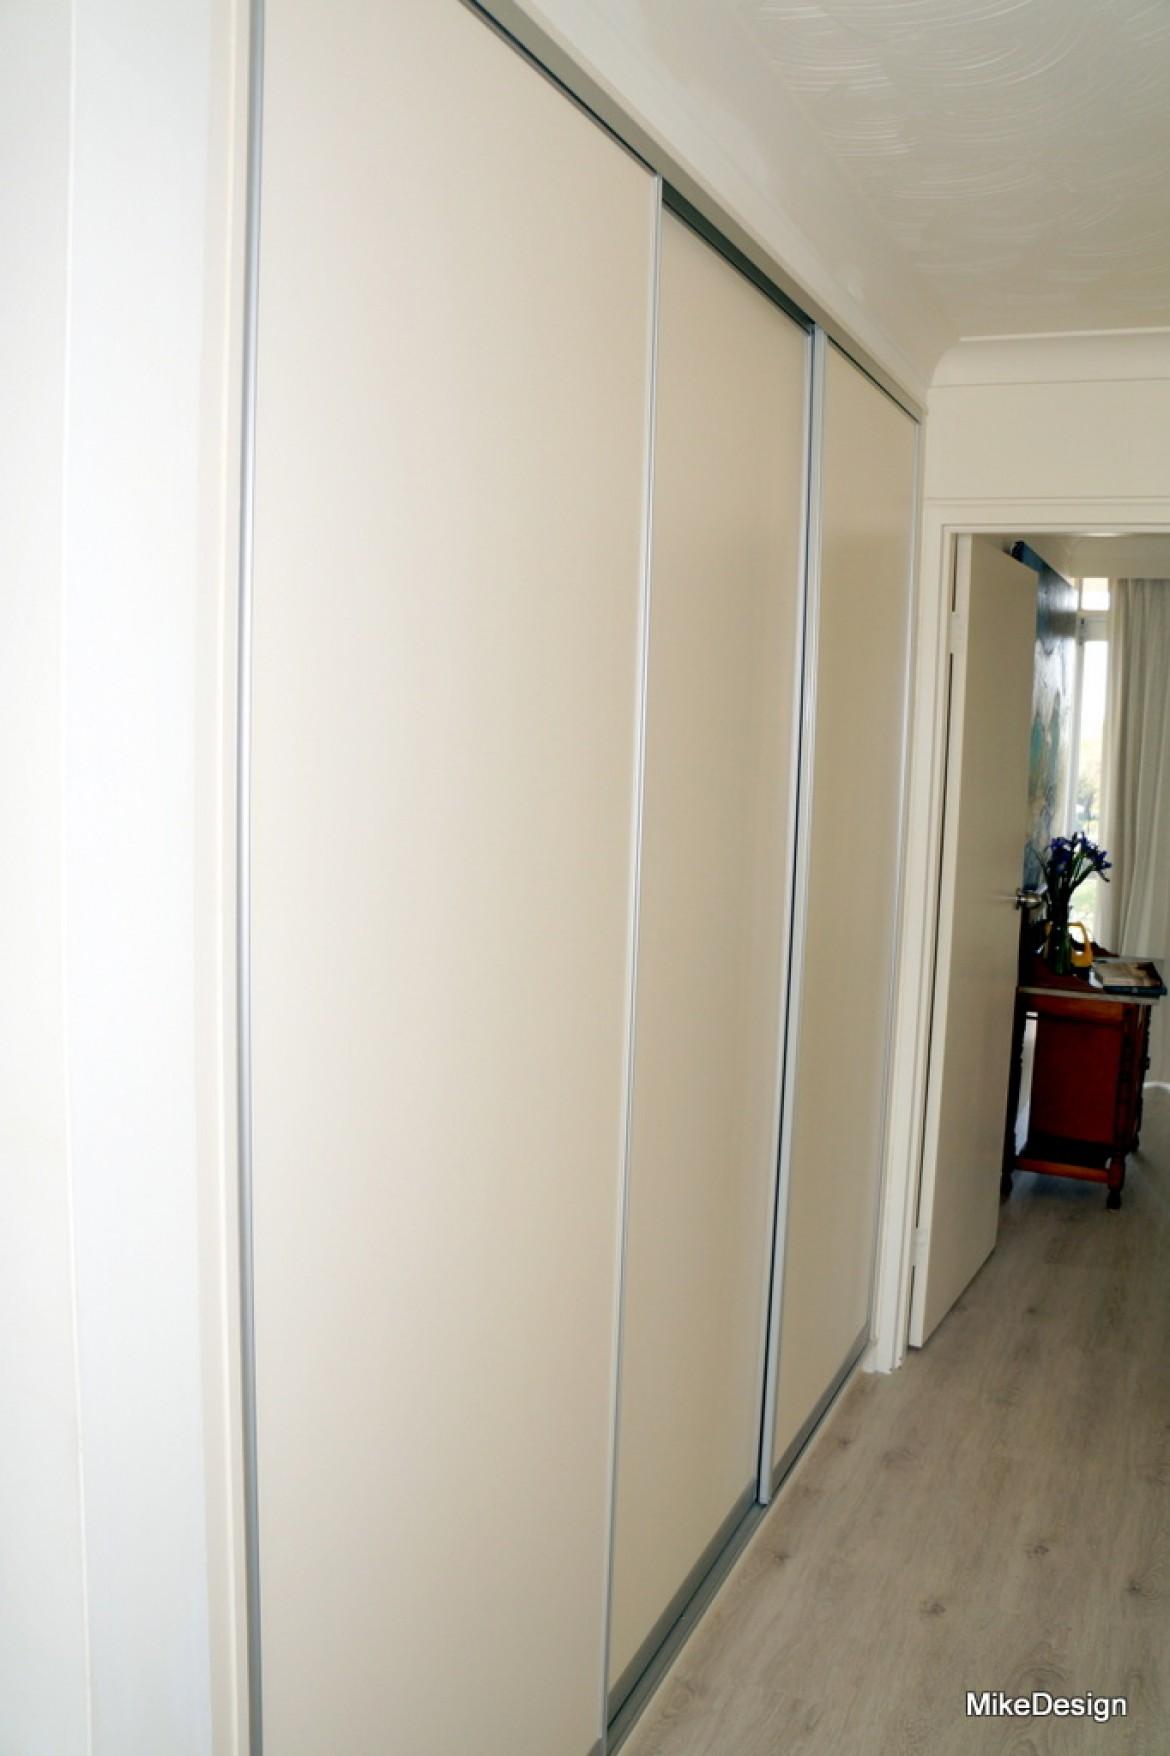 Hallway Storage Cabinet With Slimline Sliding Doors Mike Design